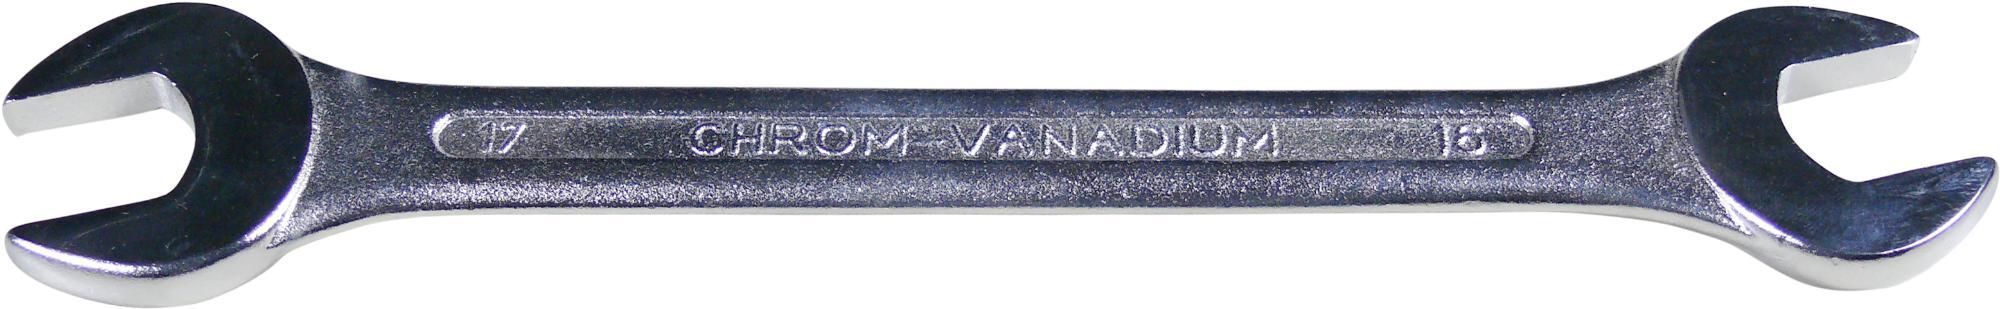 Kľúč vidlica-vidlica, 14x15 mm